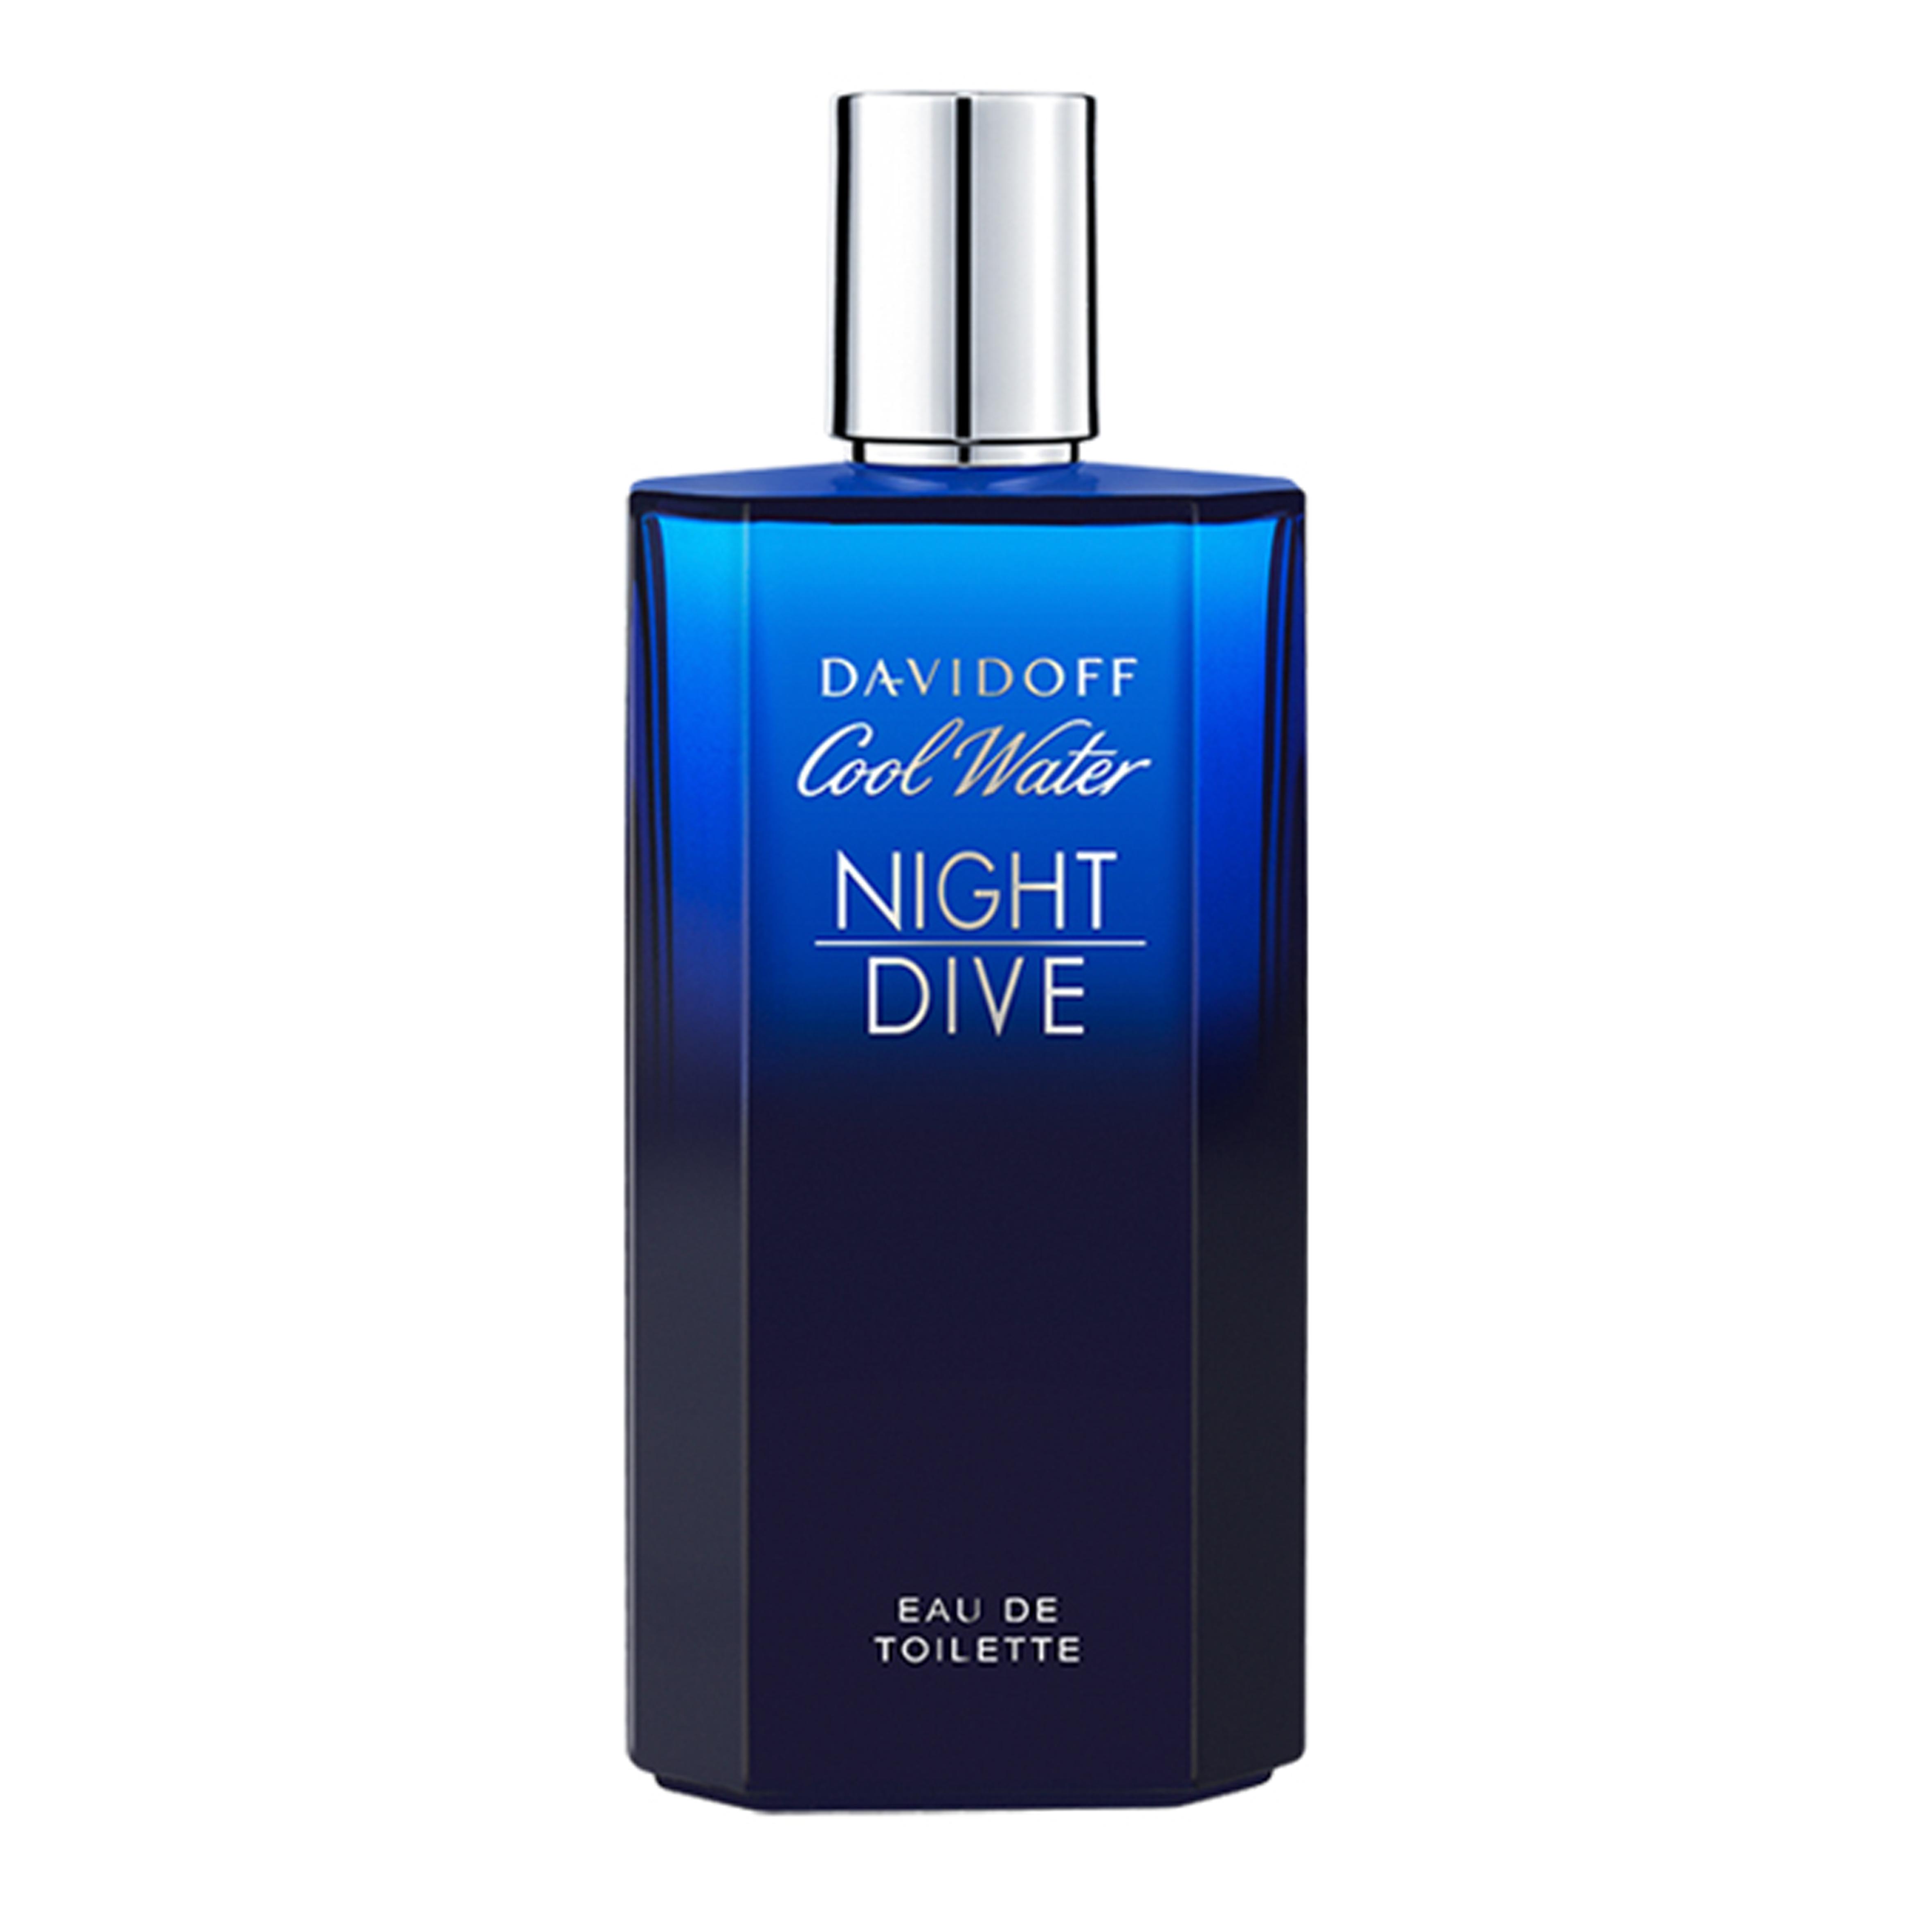 DAVIDOFF - COOL WATER NIGHT DIVE EDT 125 ML